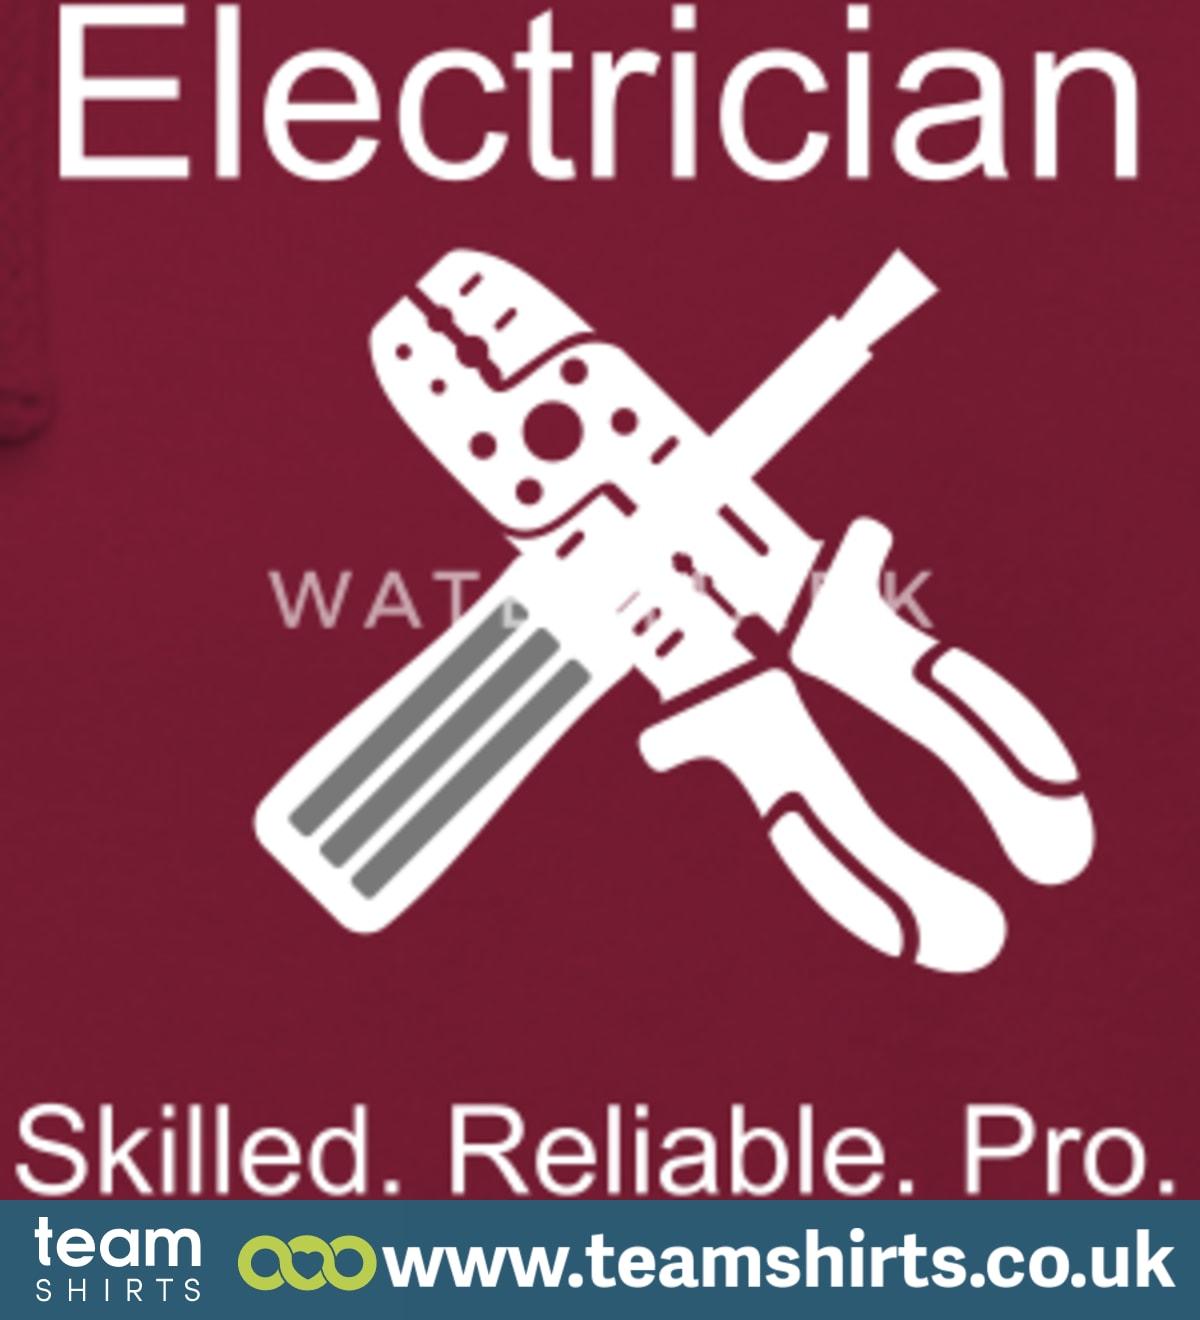 ELECTRICIAN PRO